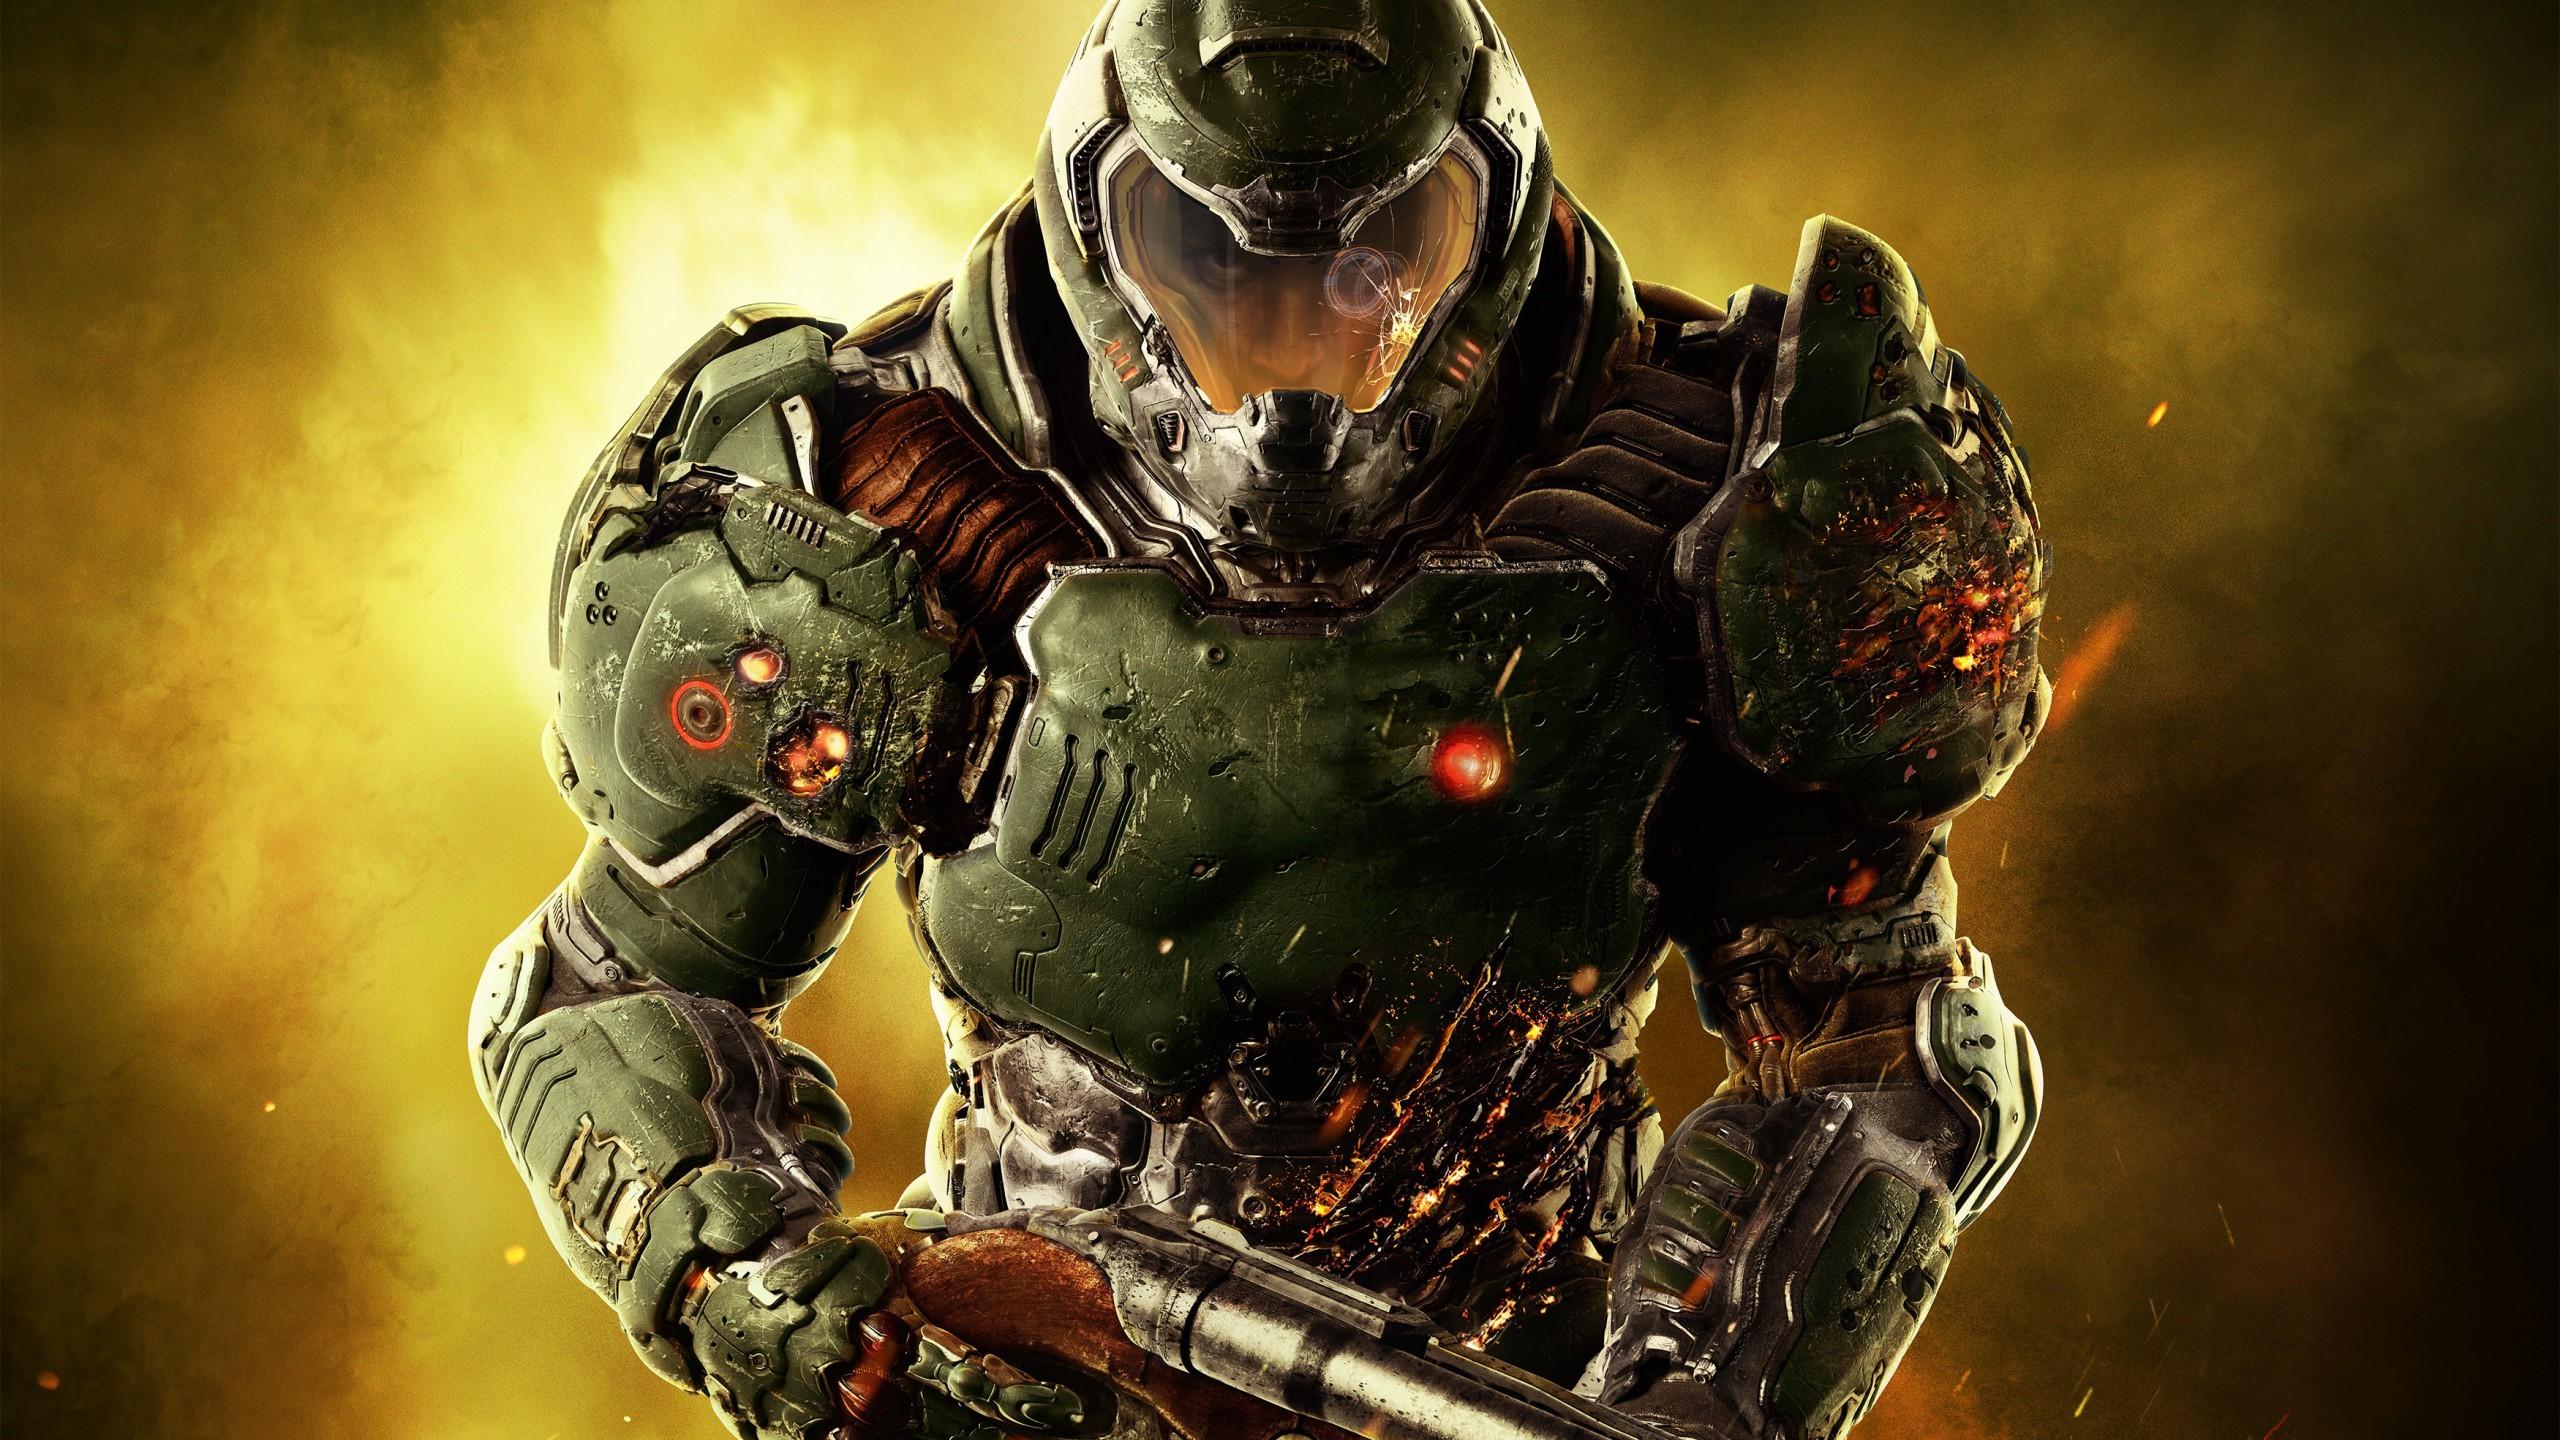 Games / Doom Marine Wallpaper